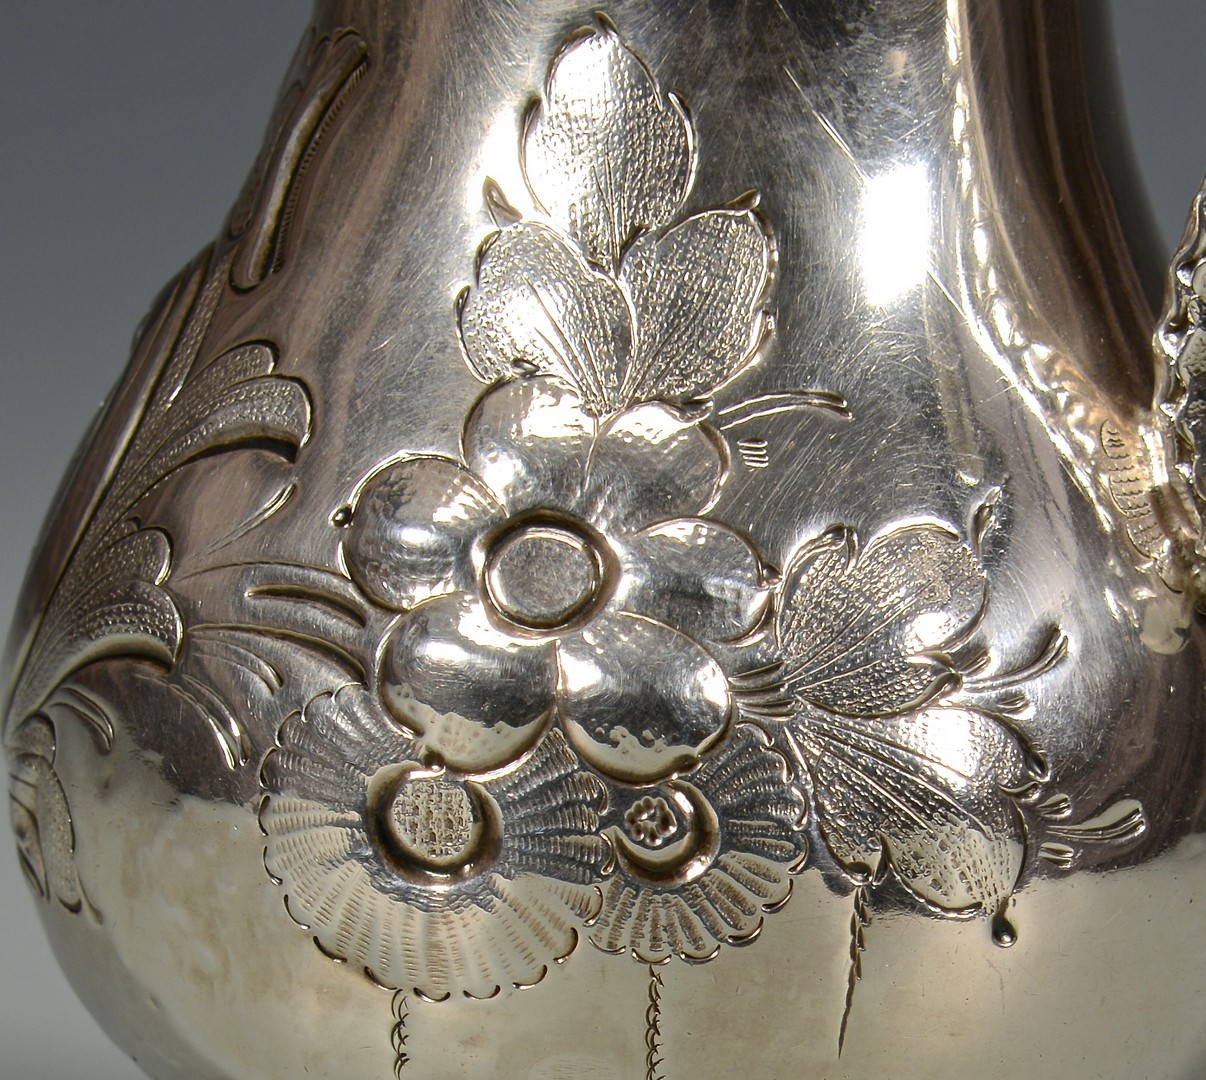 Lot 130: T. Gowdey Nashville Coin Silver Creamer